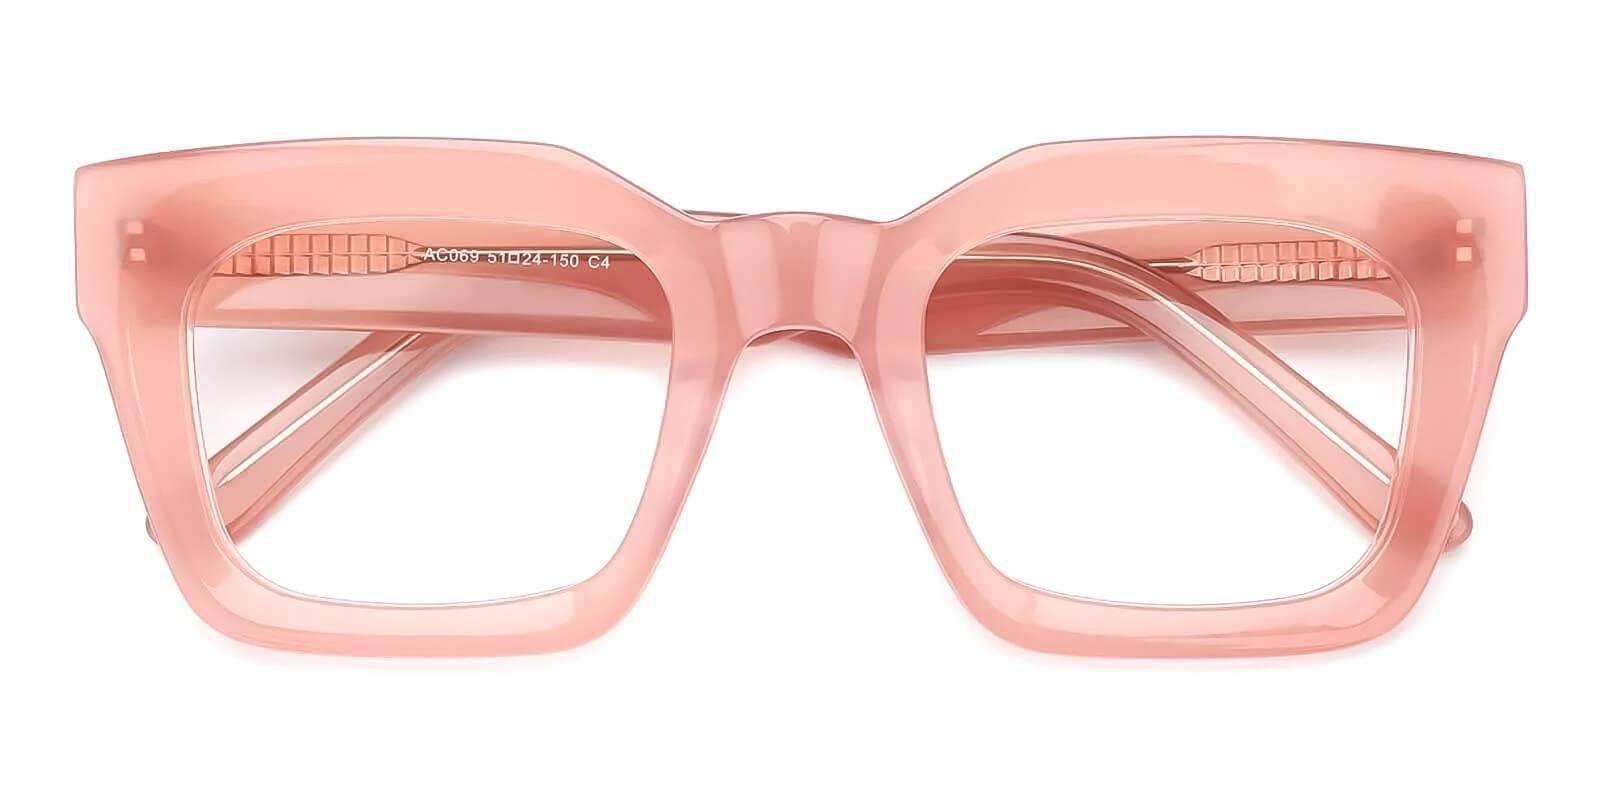 Cloud Pink Acetate Eyeglasses , Fashion , UniversalBridgeFit Frames from ABBE Glasses